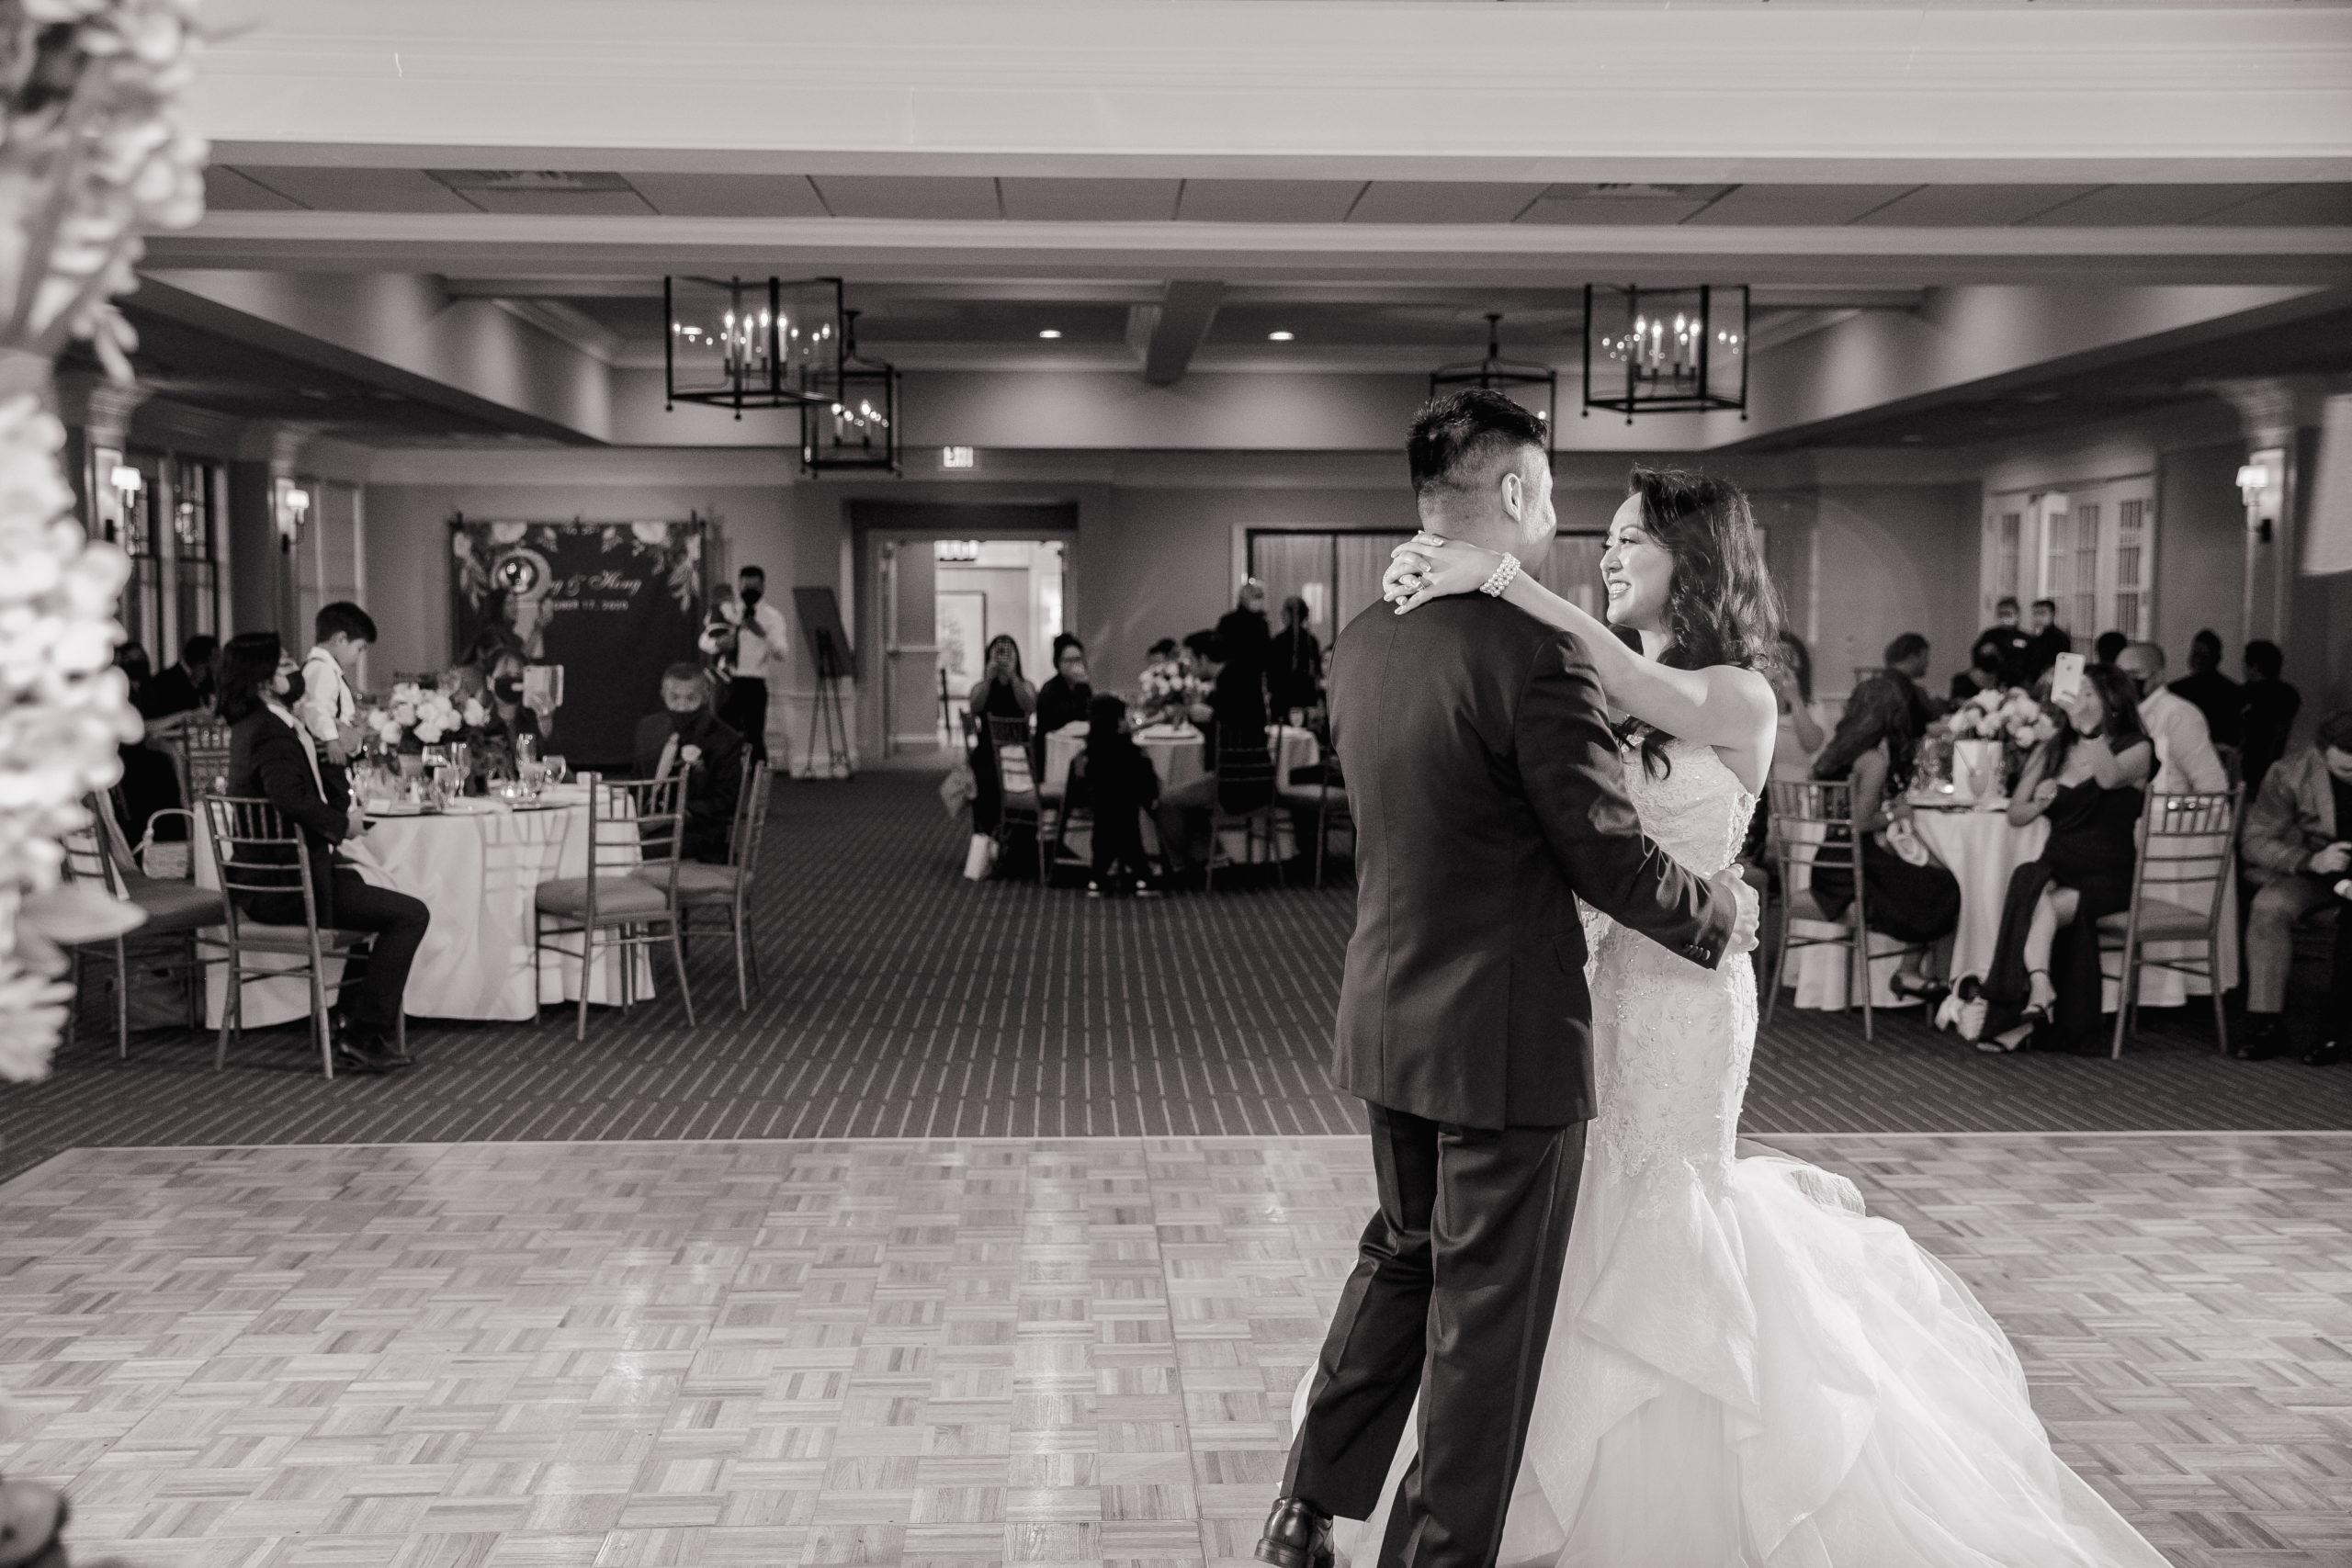 Harbor lights, warwick, rhode island, RI, Tracy Jenkins Photography, RI wedding photographer, Rhode Island wedding photographer, micro-wedding, wedding reception, first dance